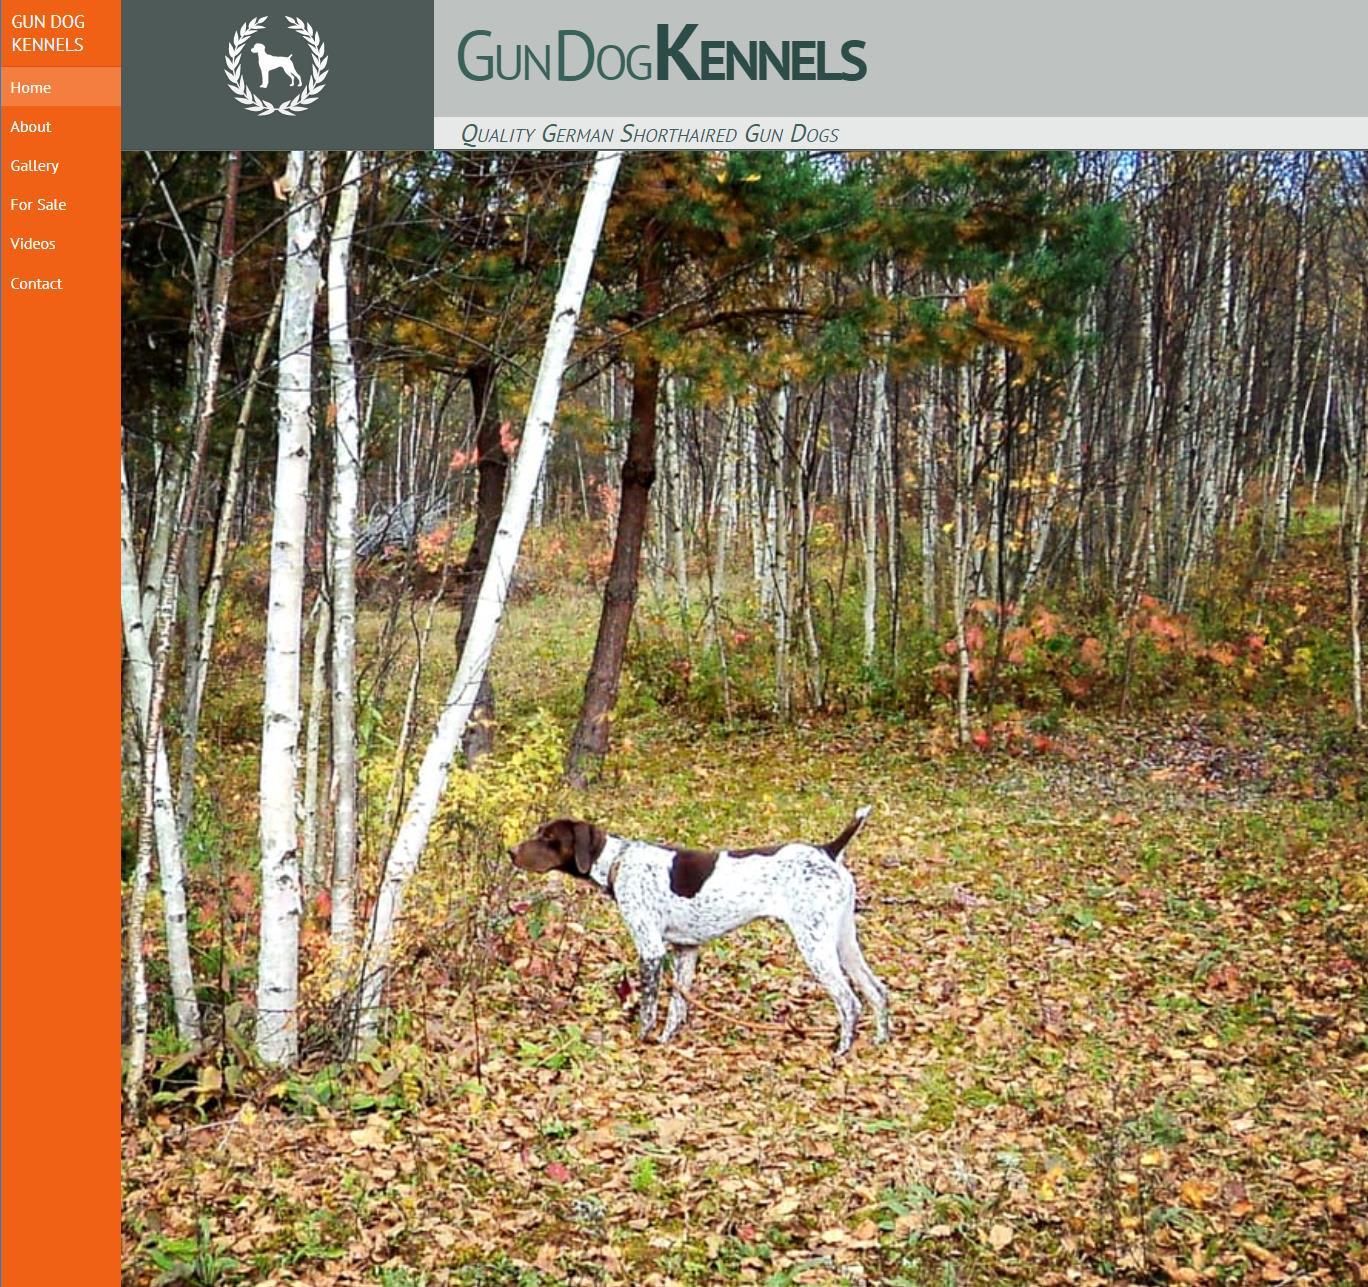 Gundog Kennels